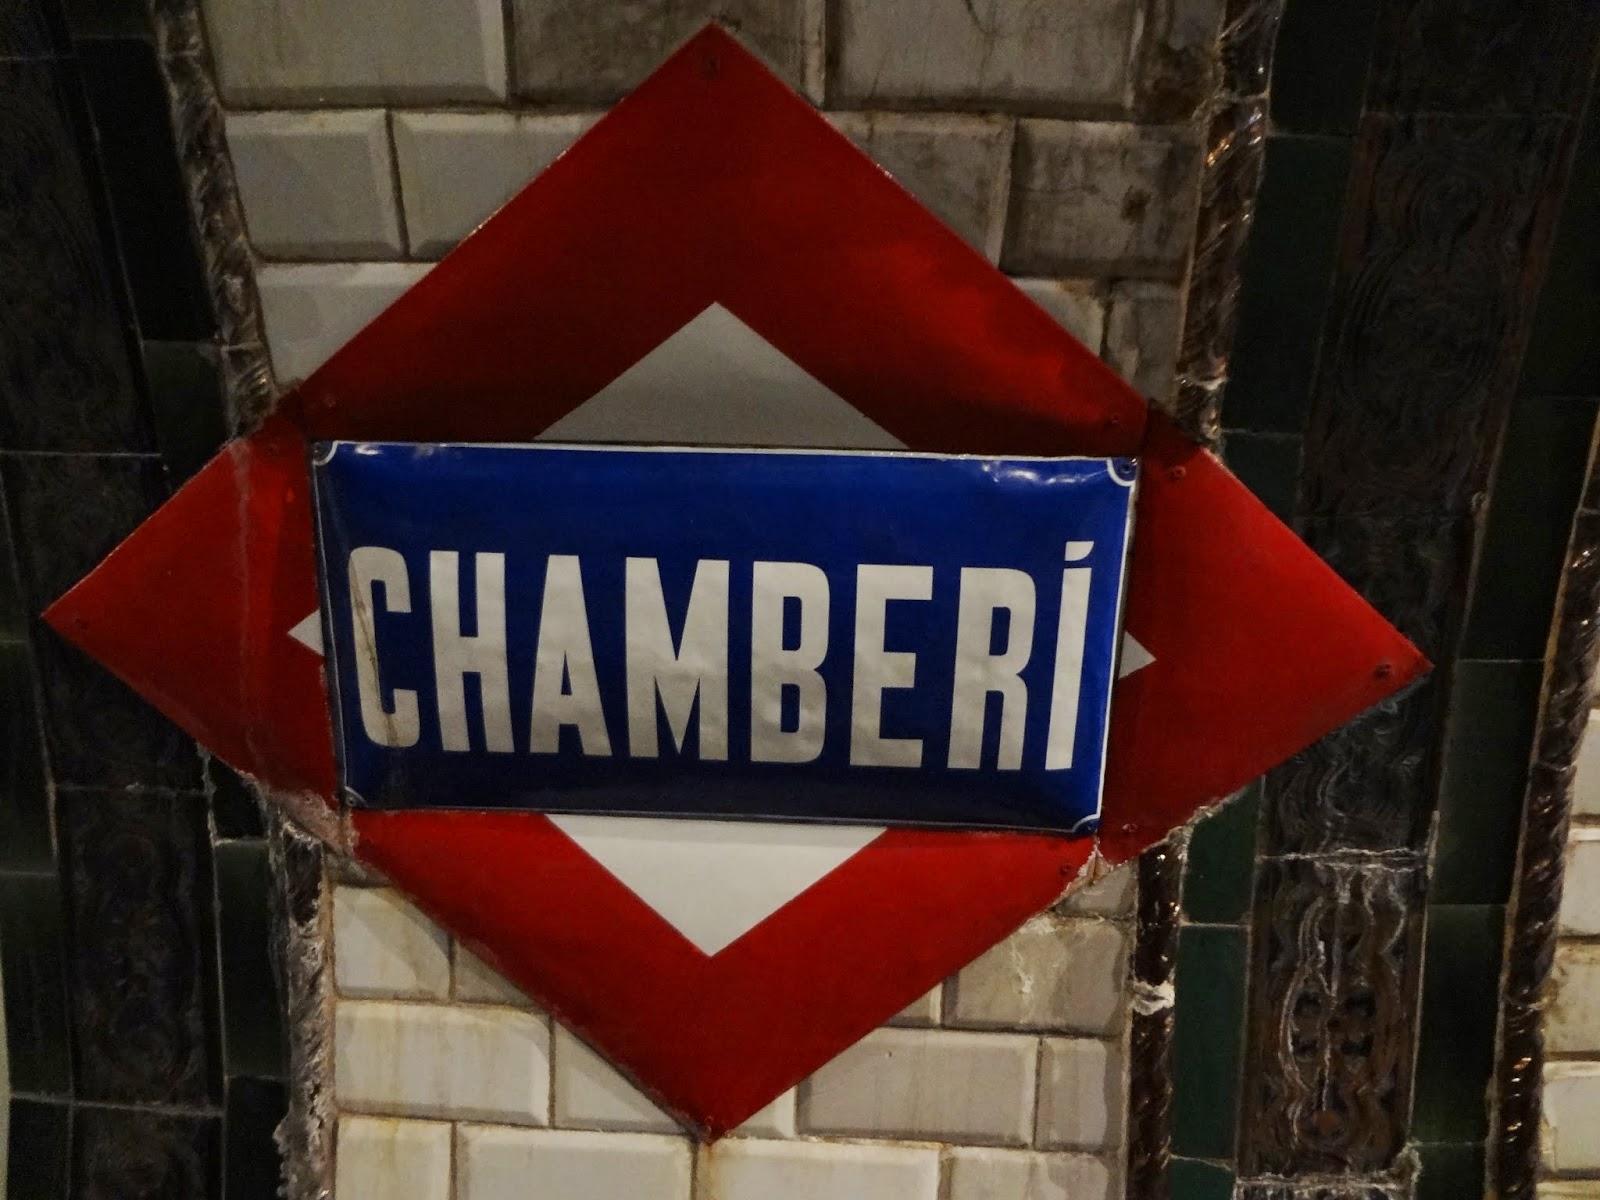 Letrero de la estación de Chamberí